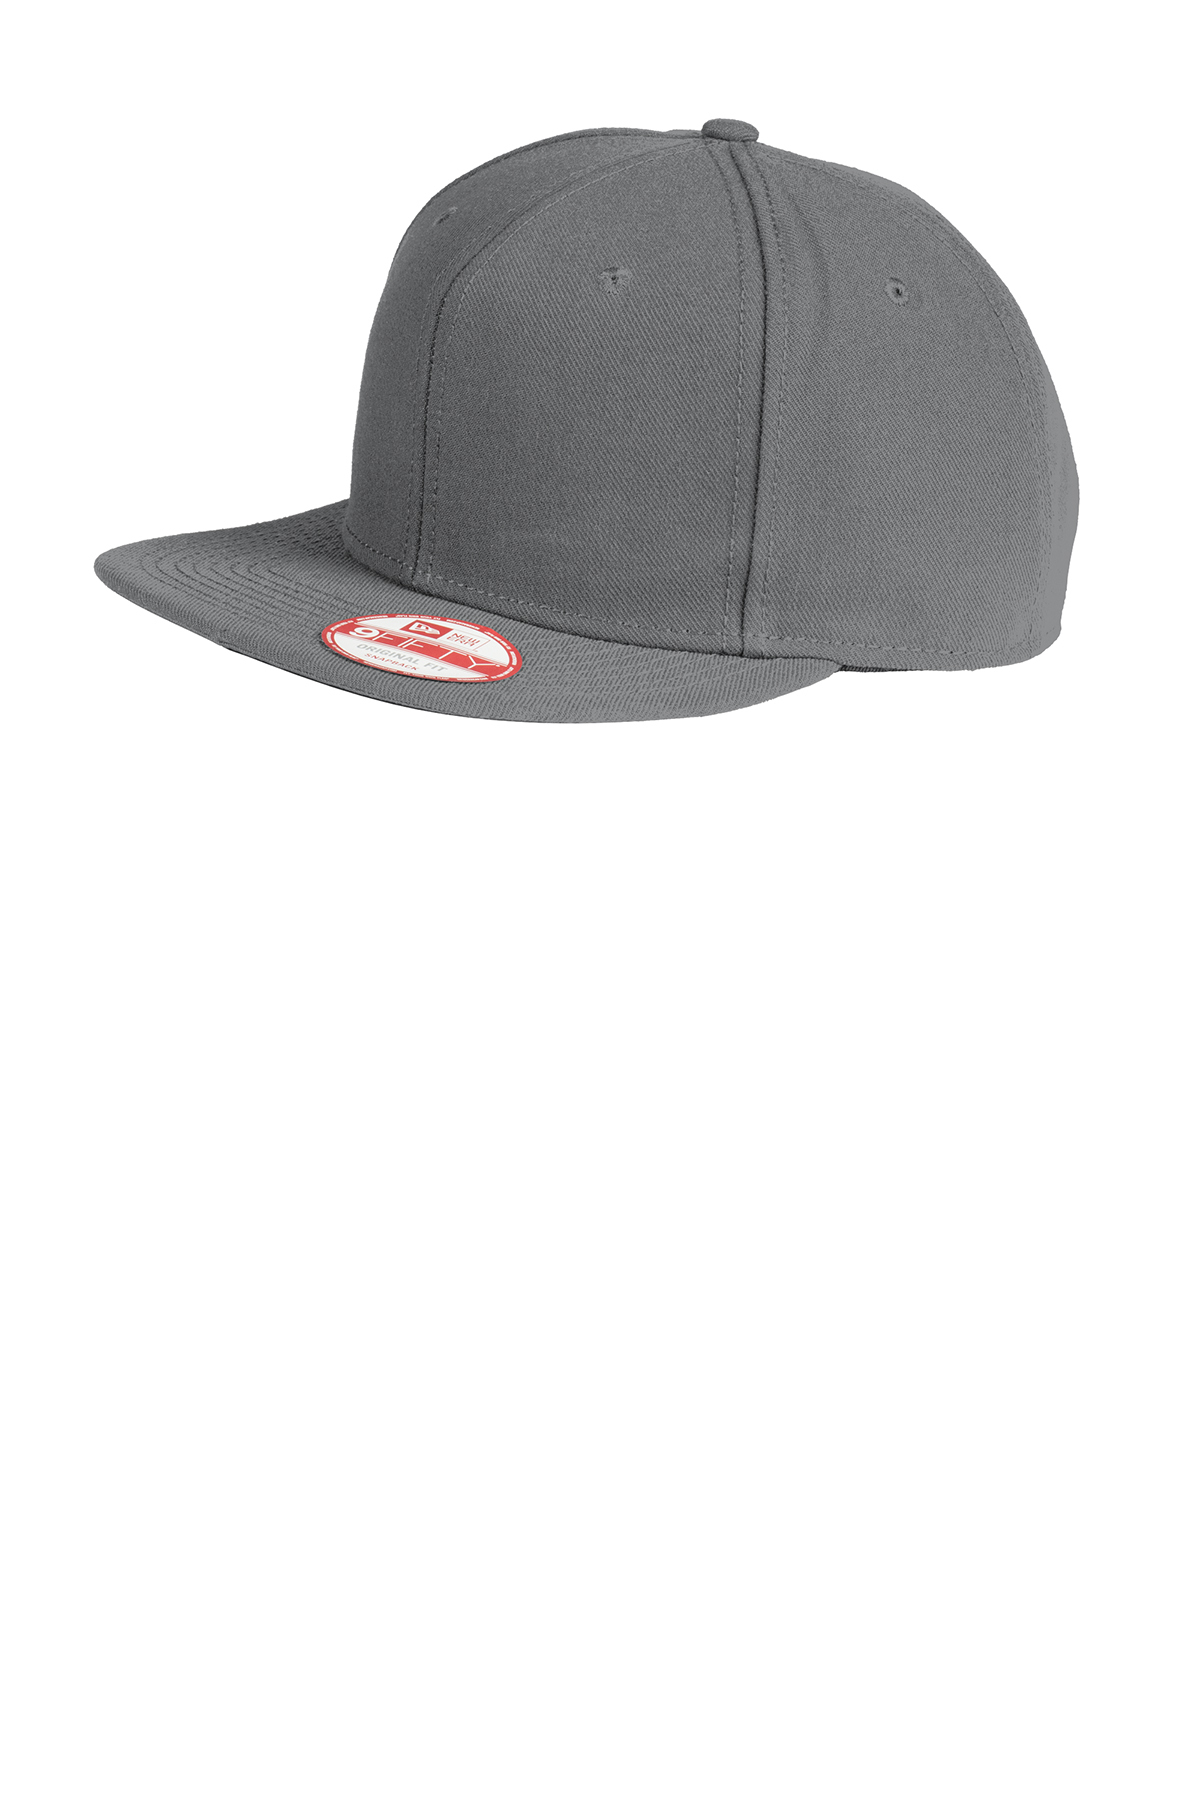 9514b3948f3ad New Era® Original Fit Flat Bill Snapback Cap